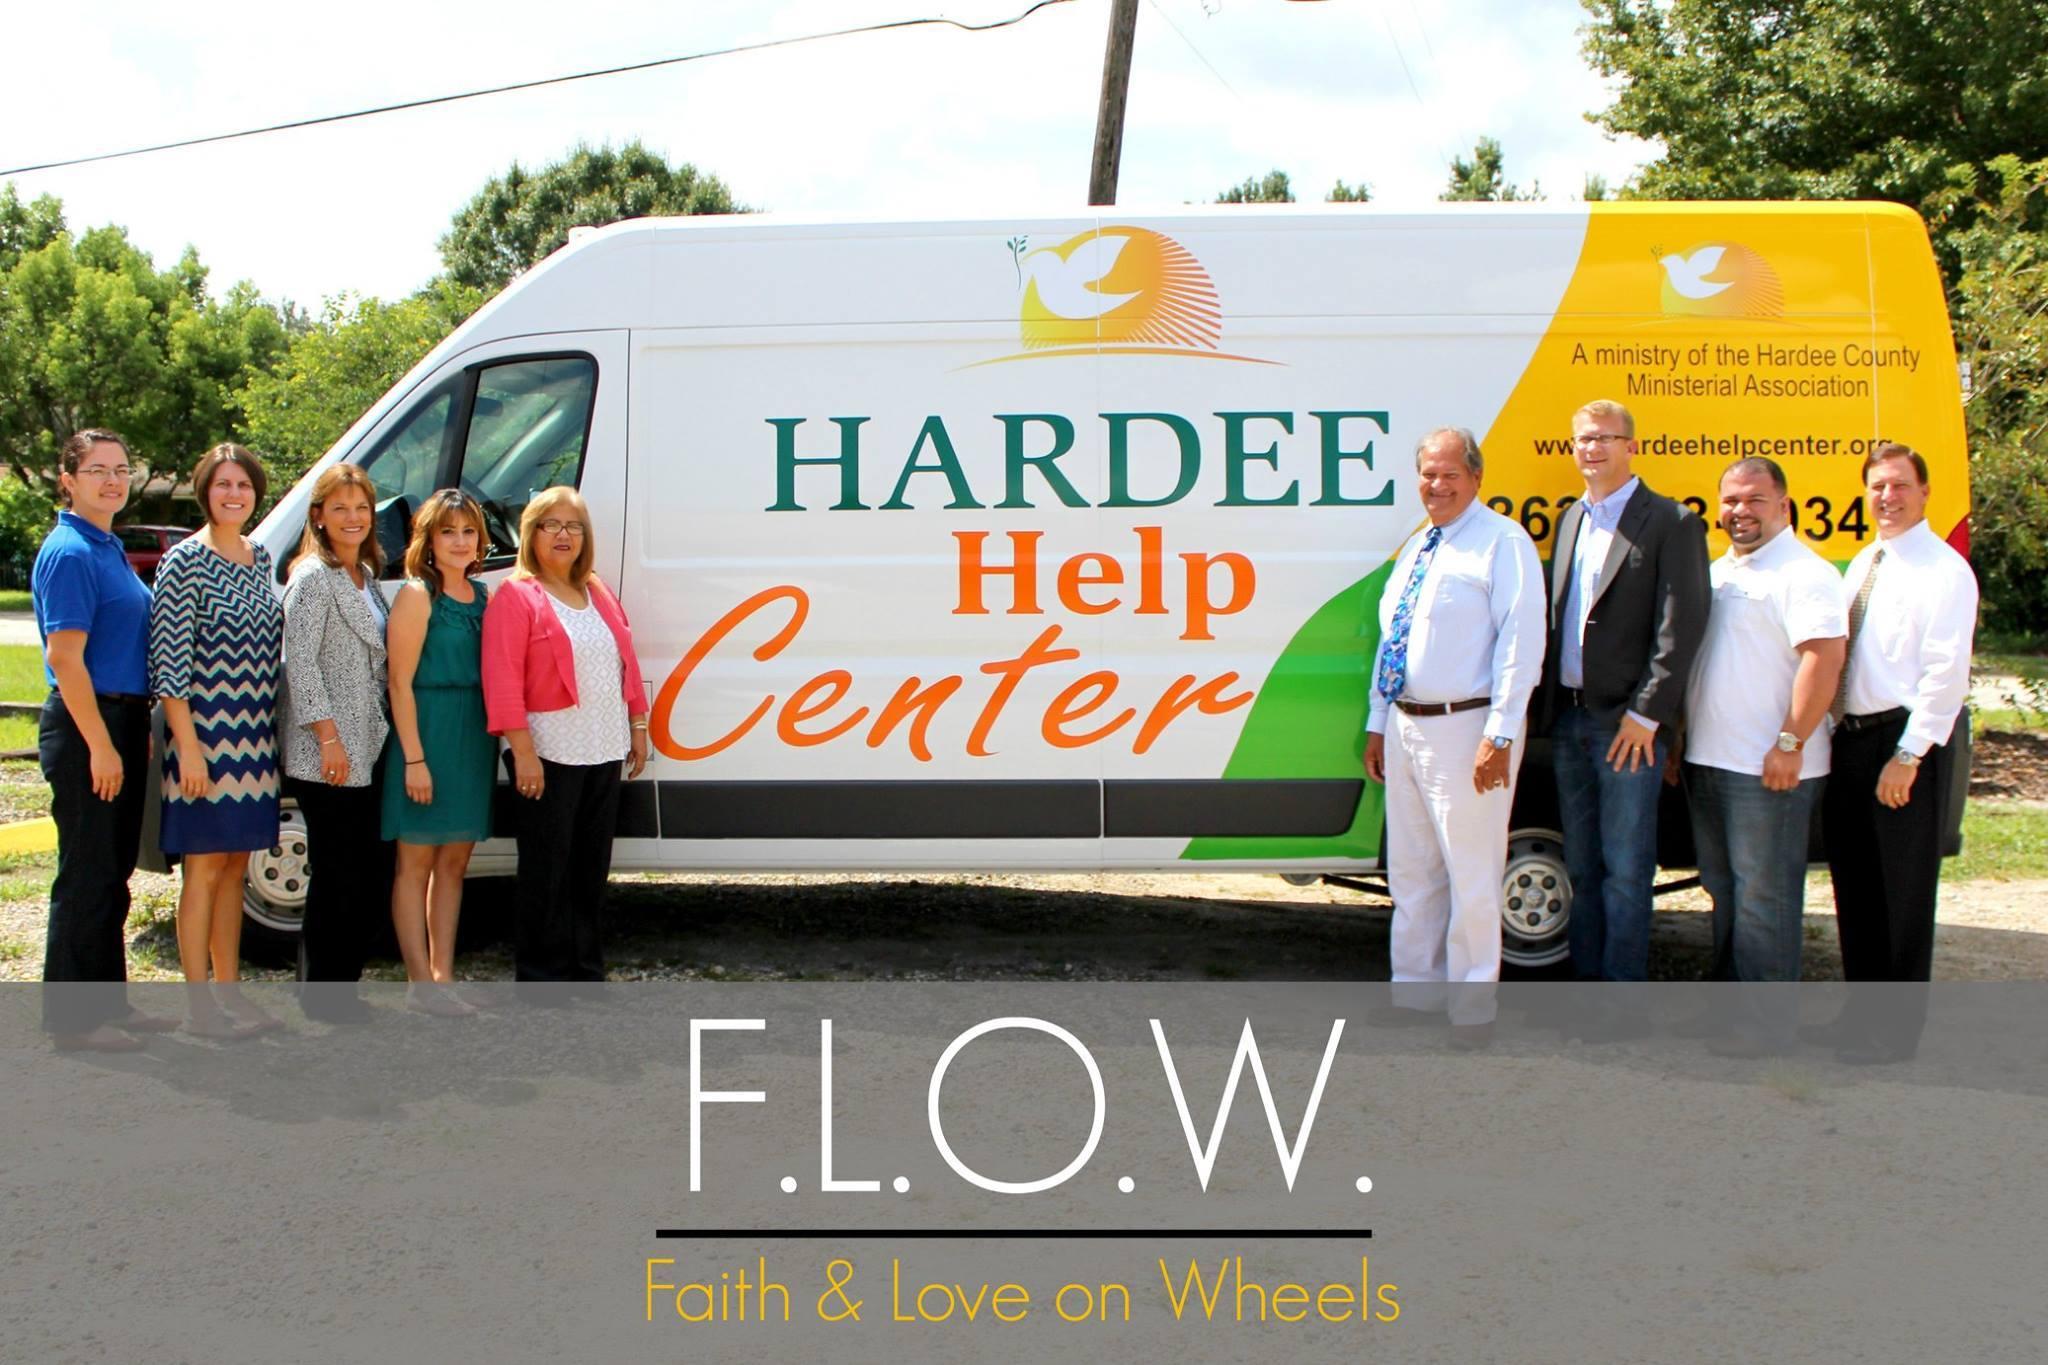 Meet F.L.O.W our van!